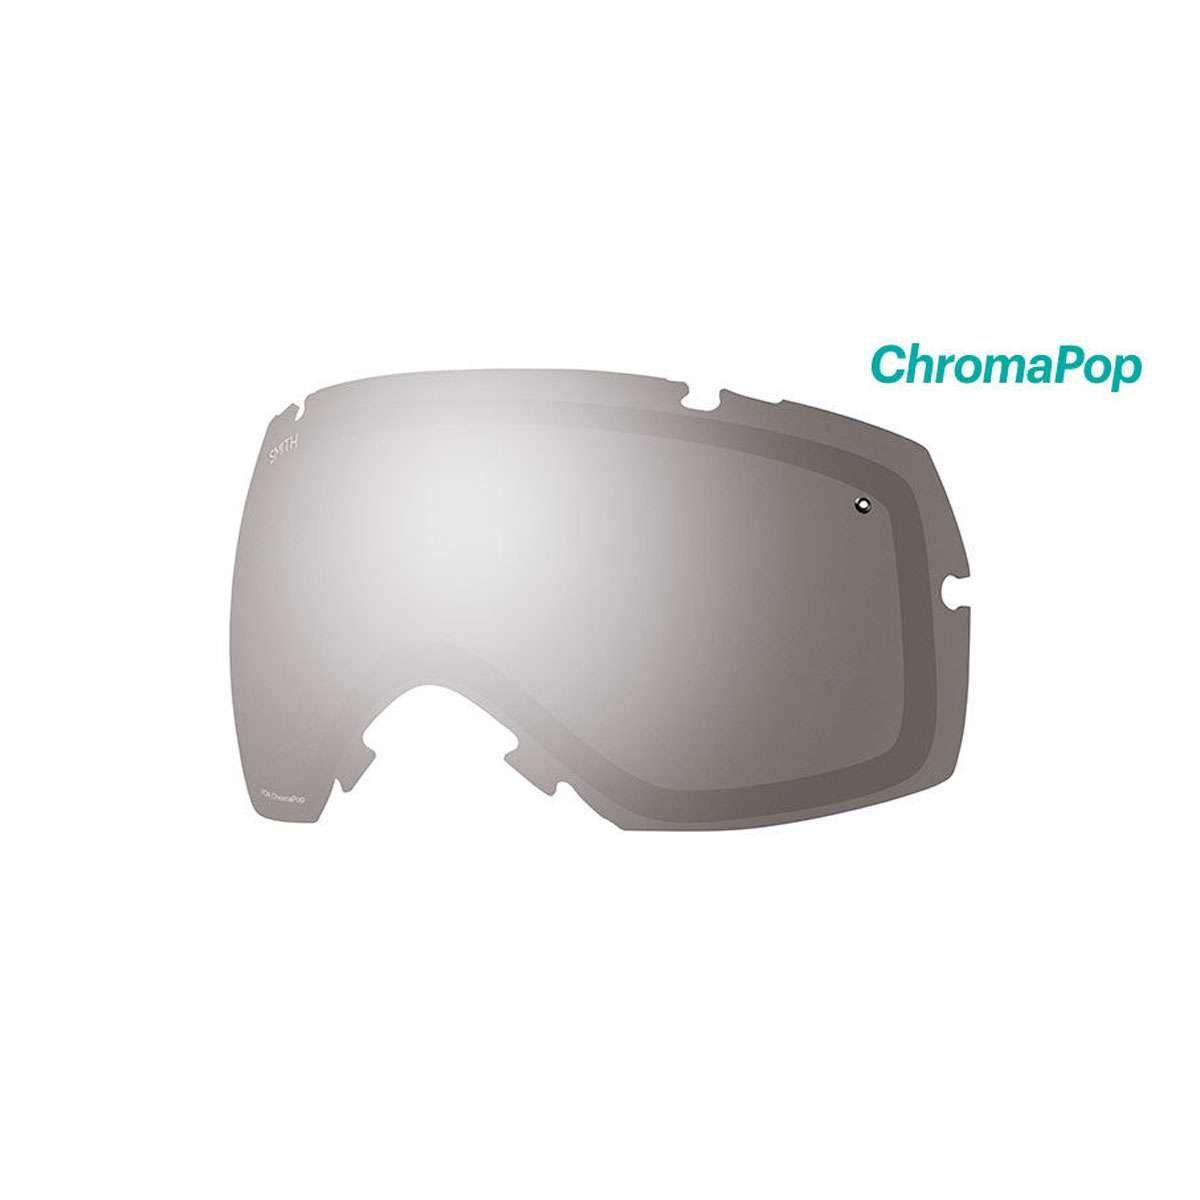 スミスI / OX交換レンズ – ChromaPop B0741LWF4K I/OX / Sun Platinum Mirror 13% VLT I/OX / Sun Platinum Mirror 13% VLT